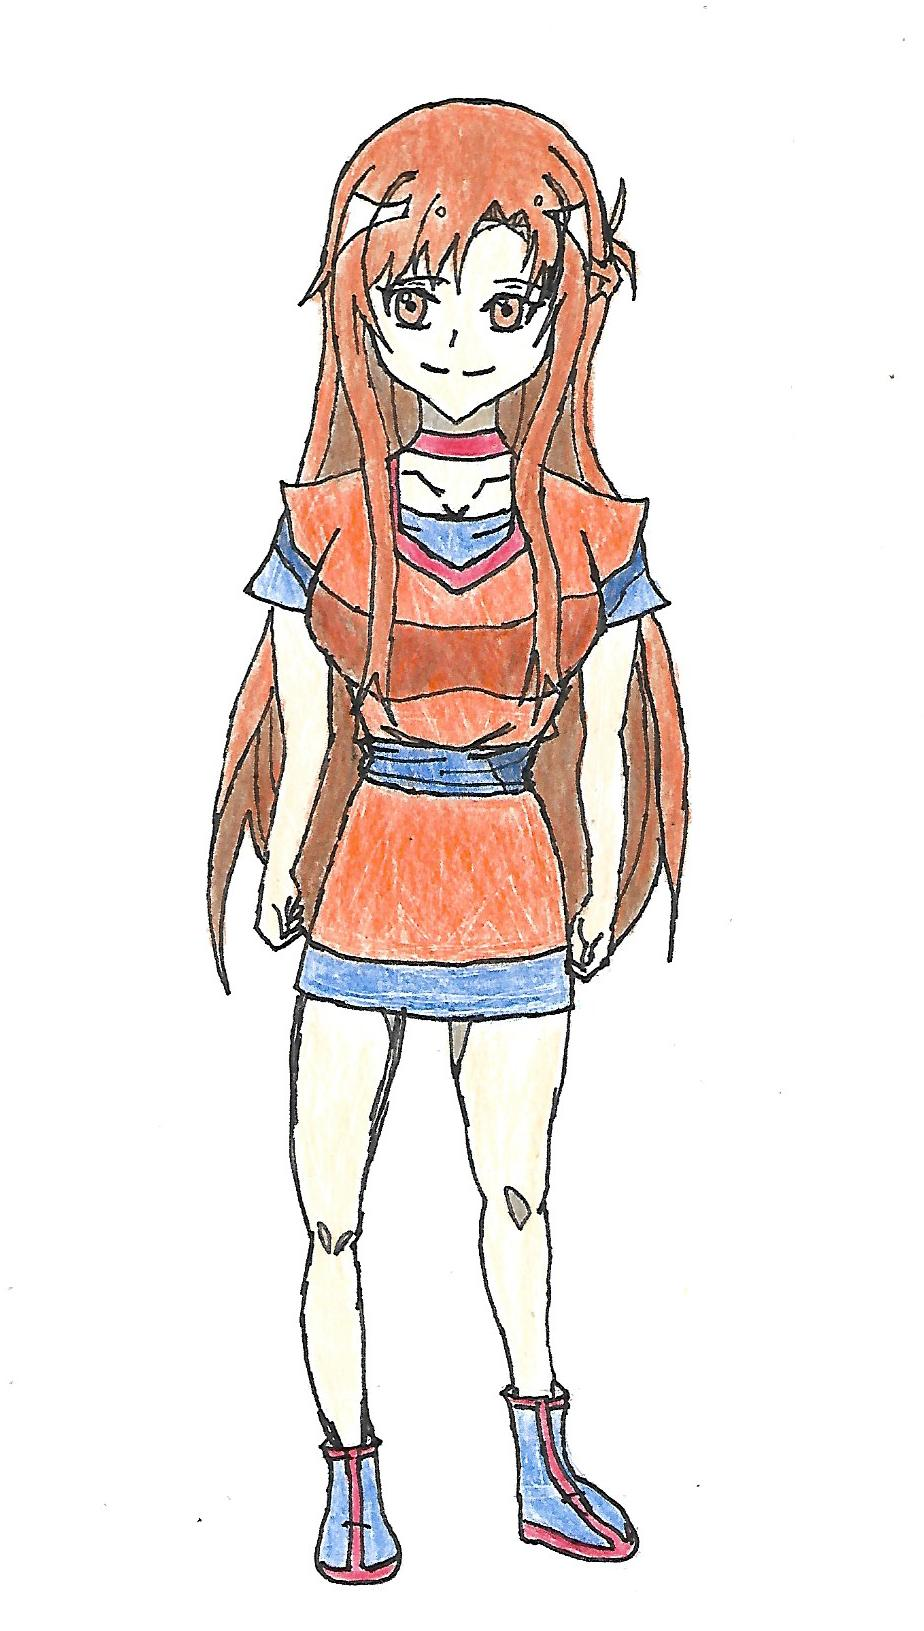 Asuna's Sword Art Online RP Clothes by spiralmaestro